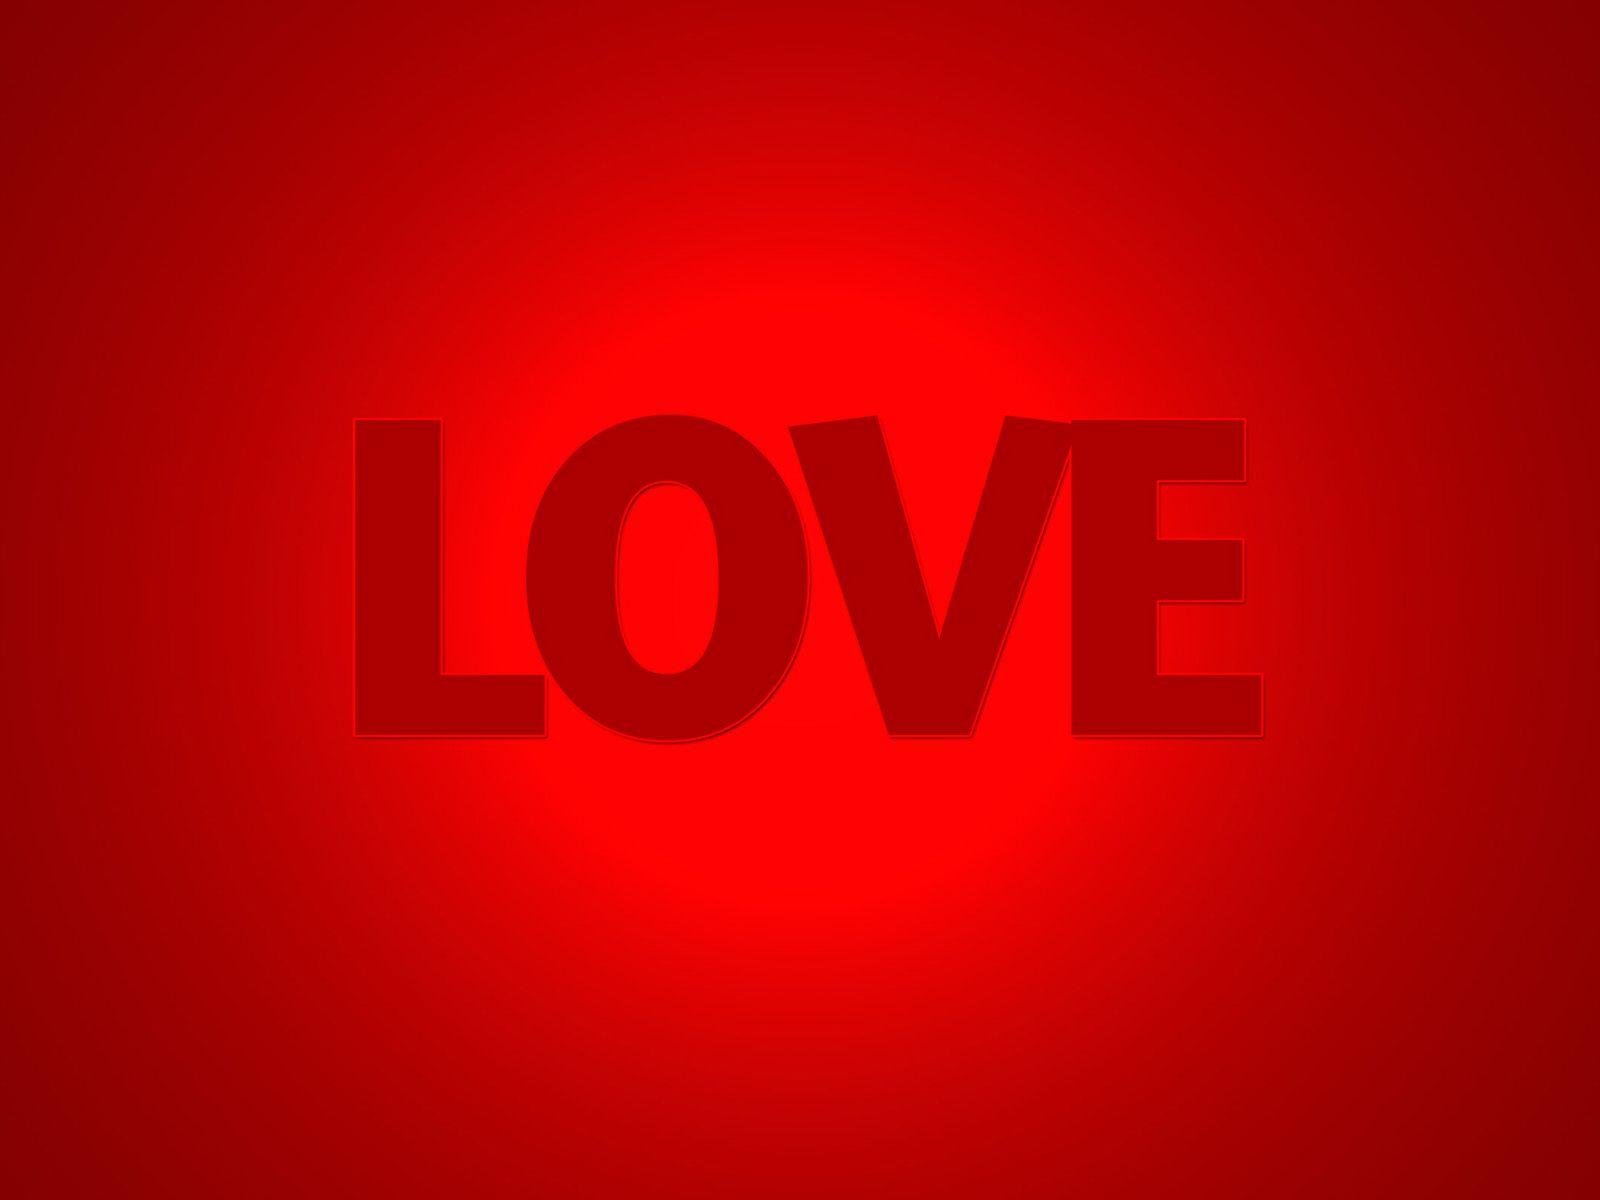 L O V E Red Images Red Colour Wallpaper Love Wallpaper